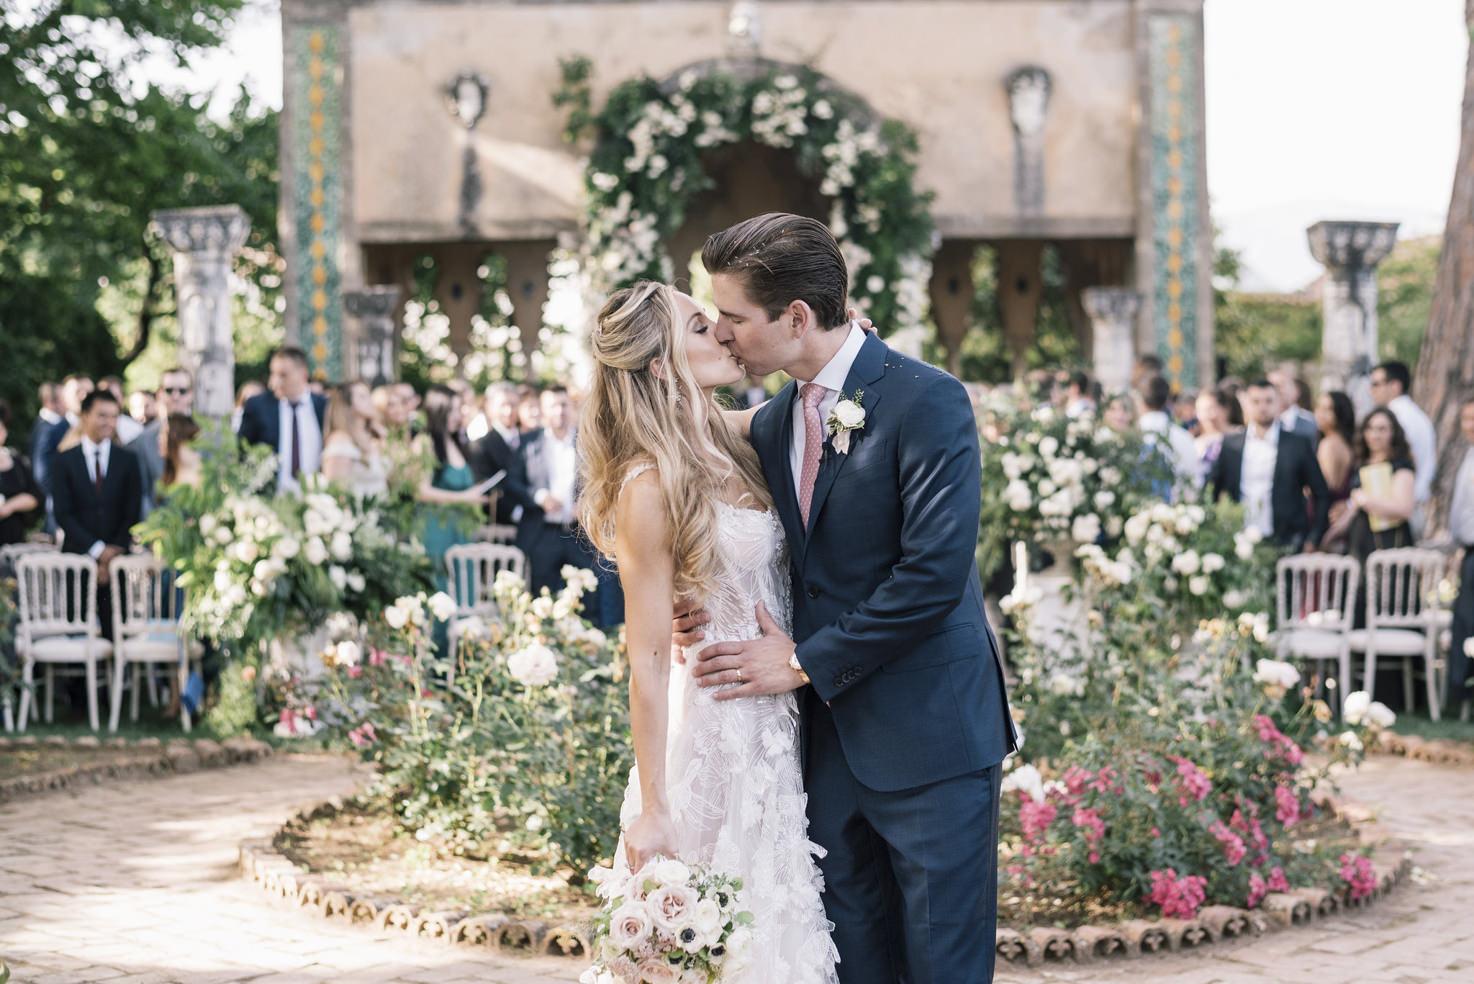 Symbolic wedding in Italy